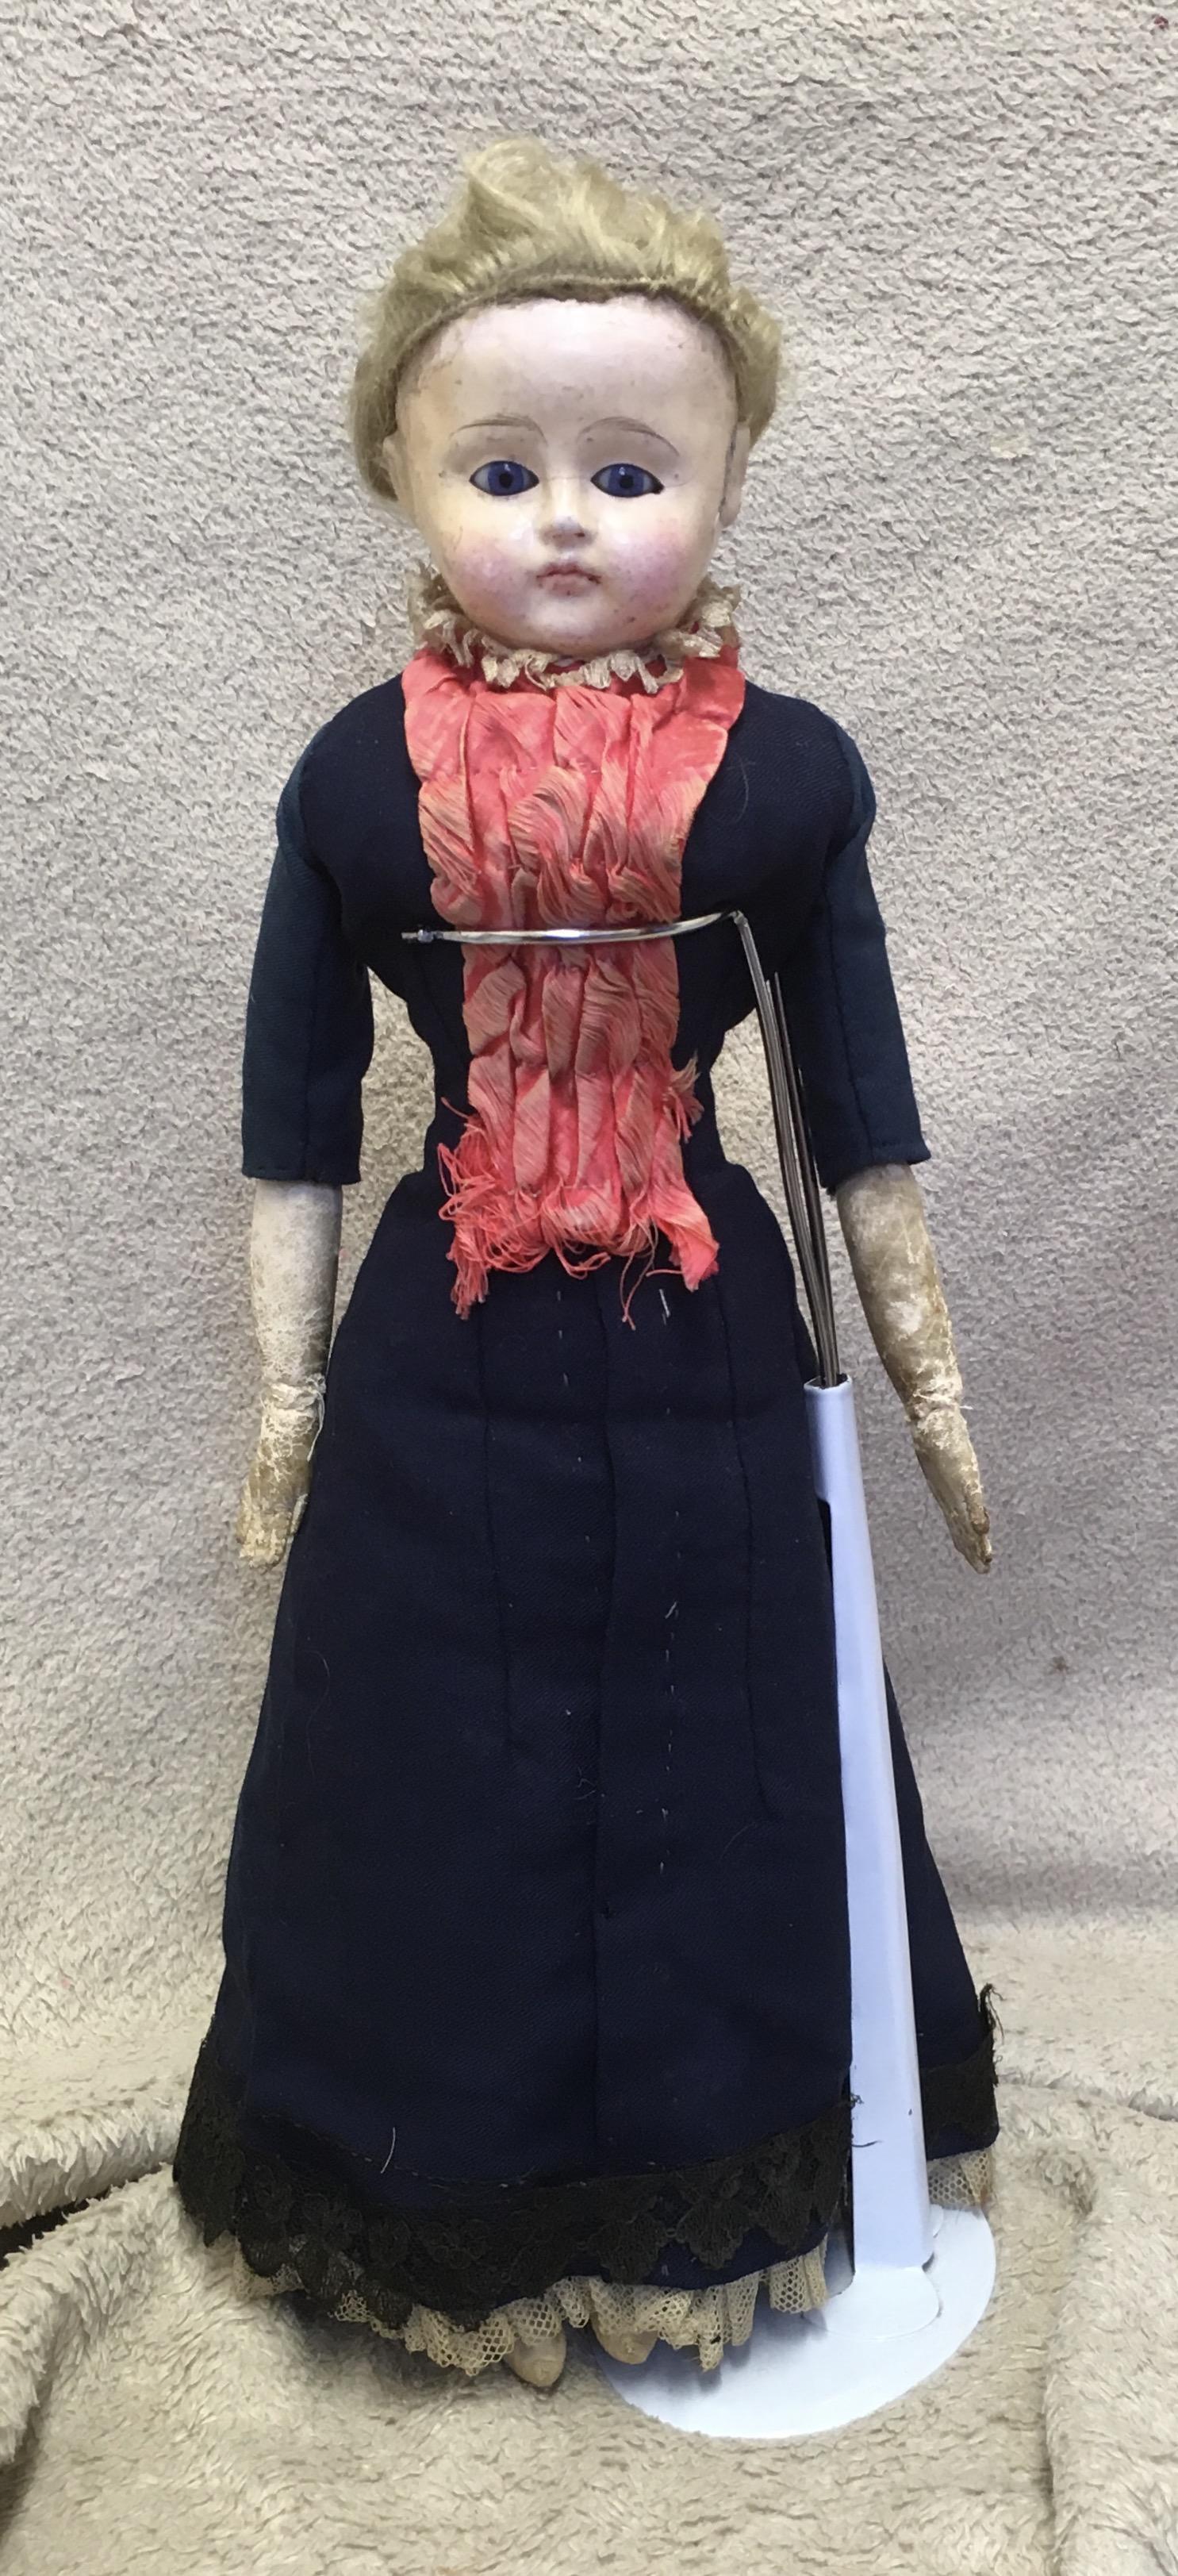 Antique paper mache fashion doll.